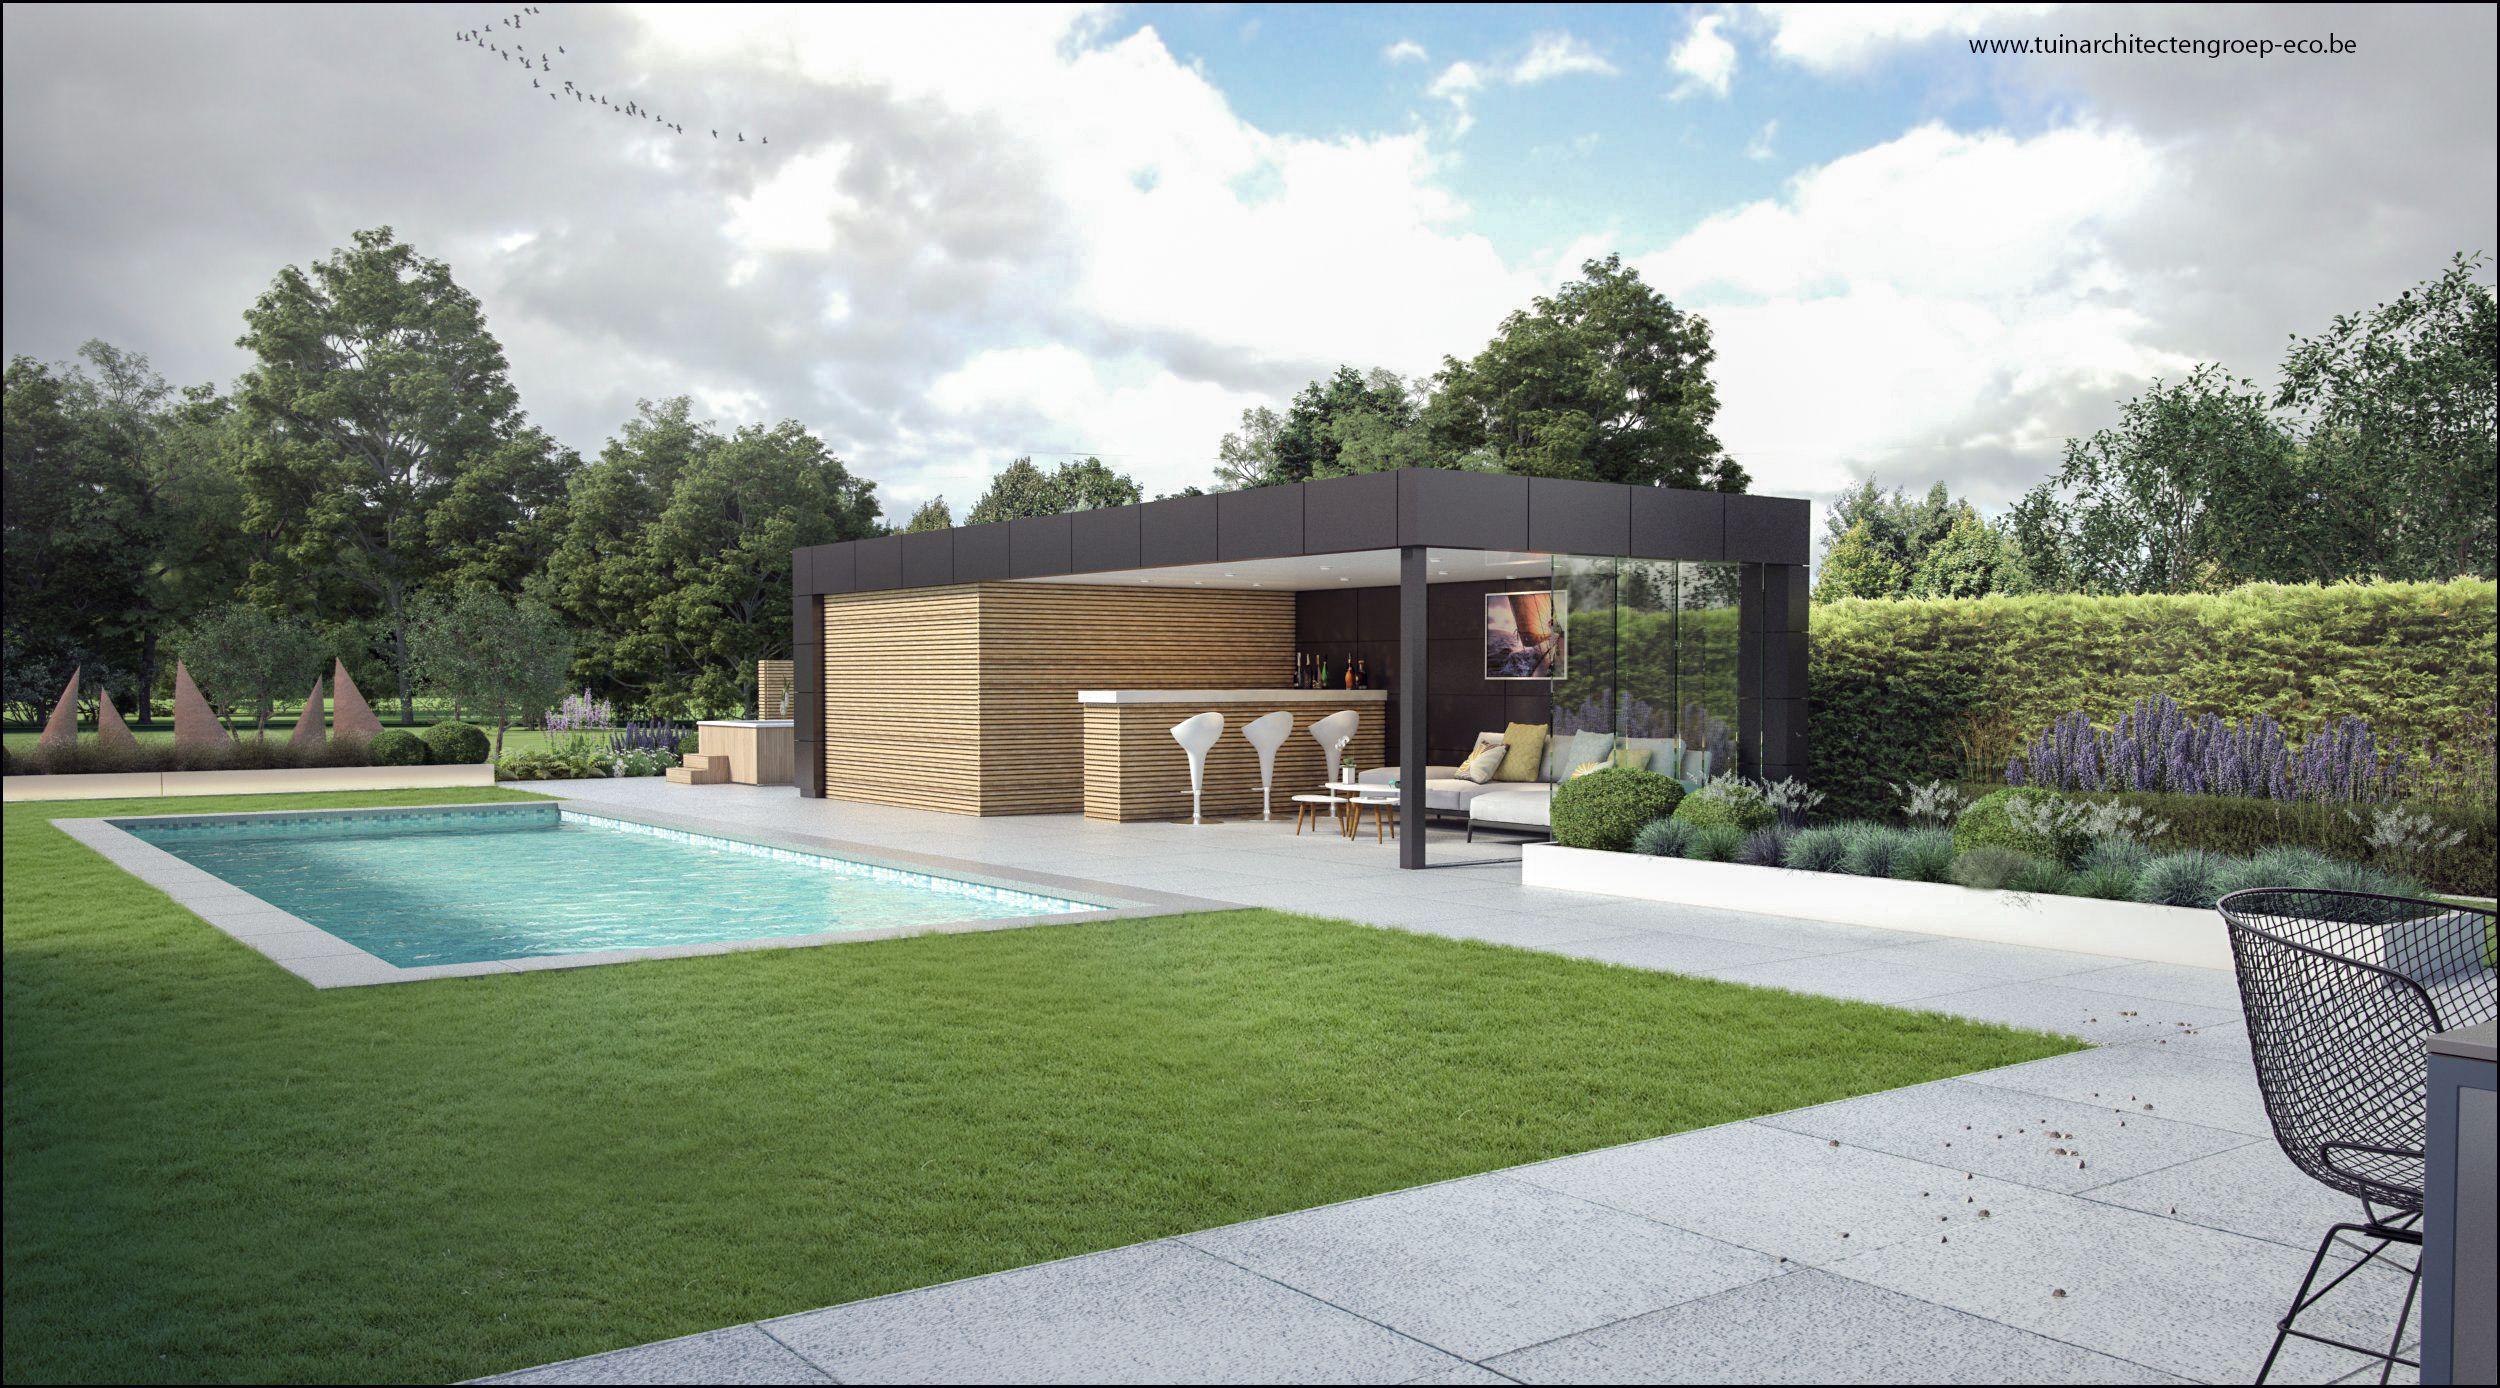 Tuinontwerp moderne tuin met poolhouse en zwambad : tuinarchitect